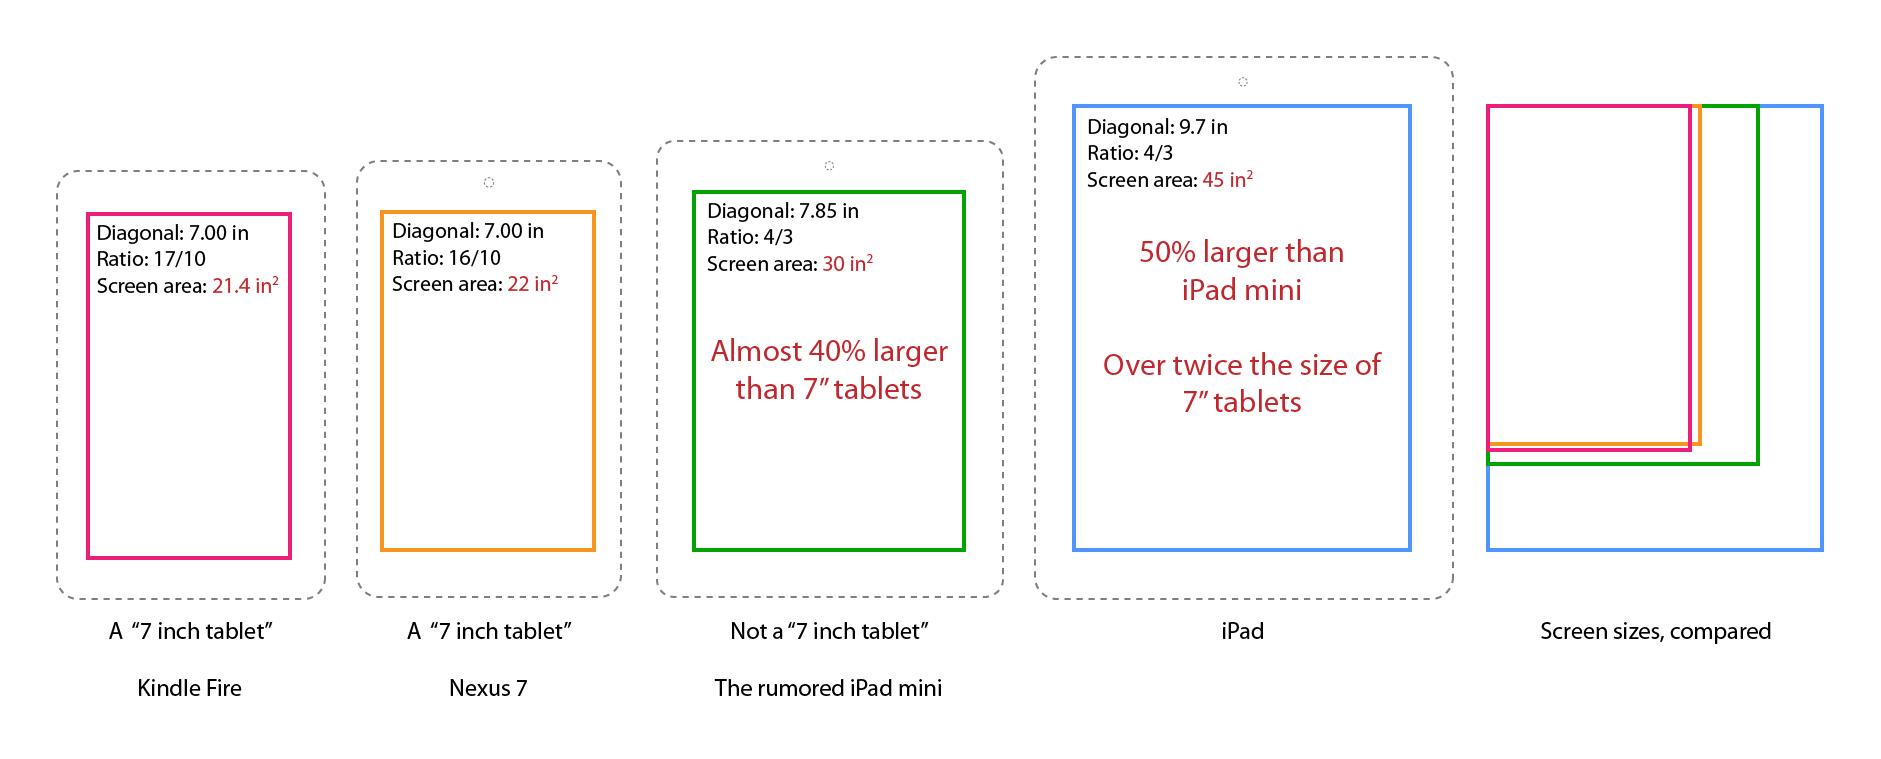 Comparativa: pantalla del mini iPad con Nexus 7 y Kindle Fire